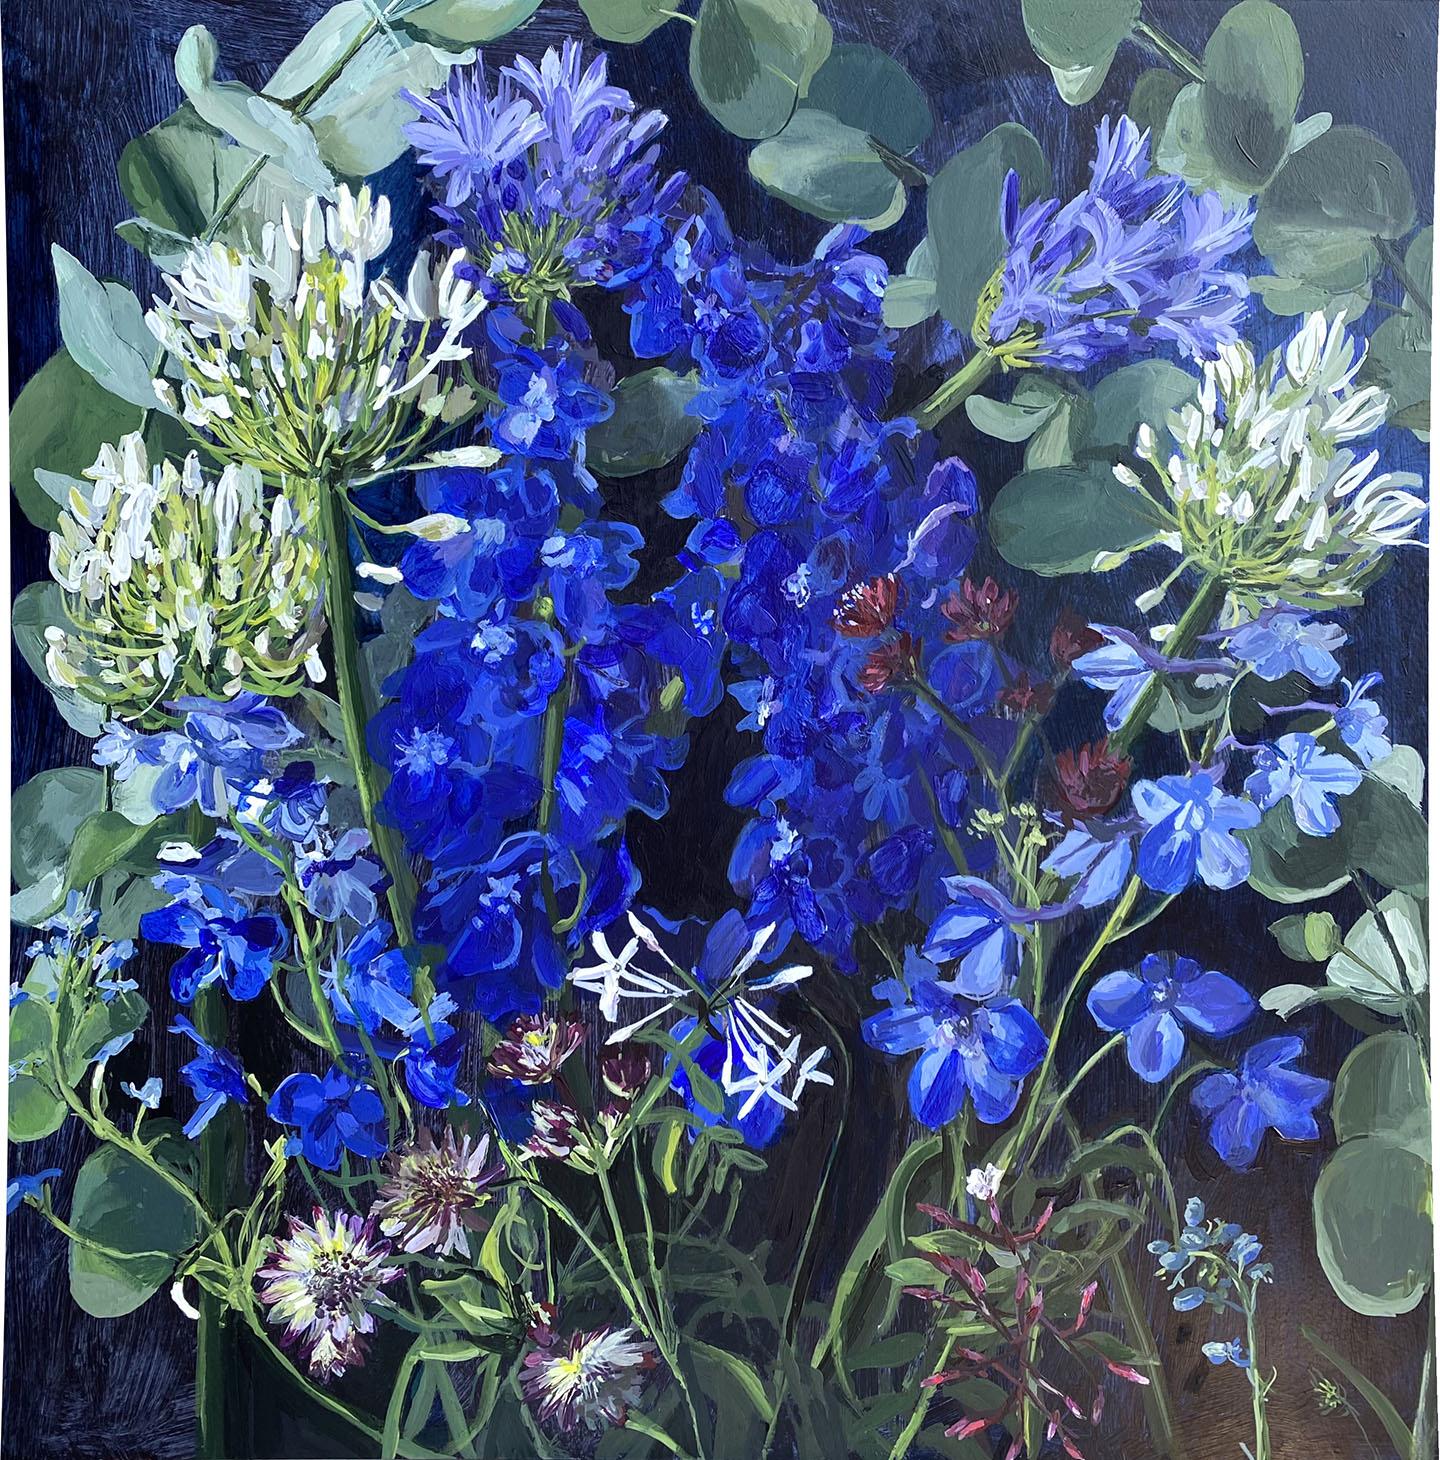 Bradley-blue-winter-solstice-1440px-wide-1